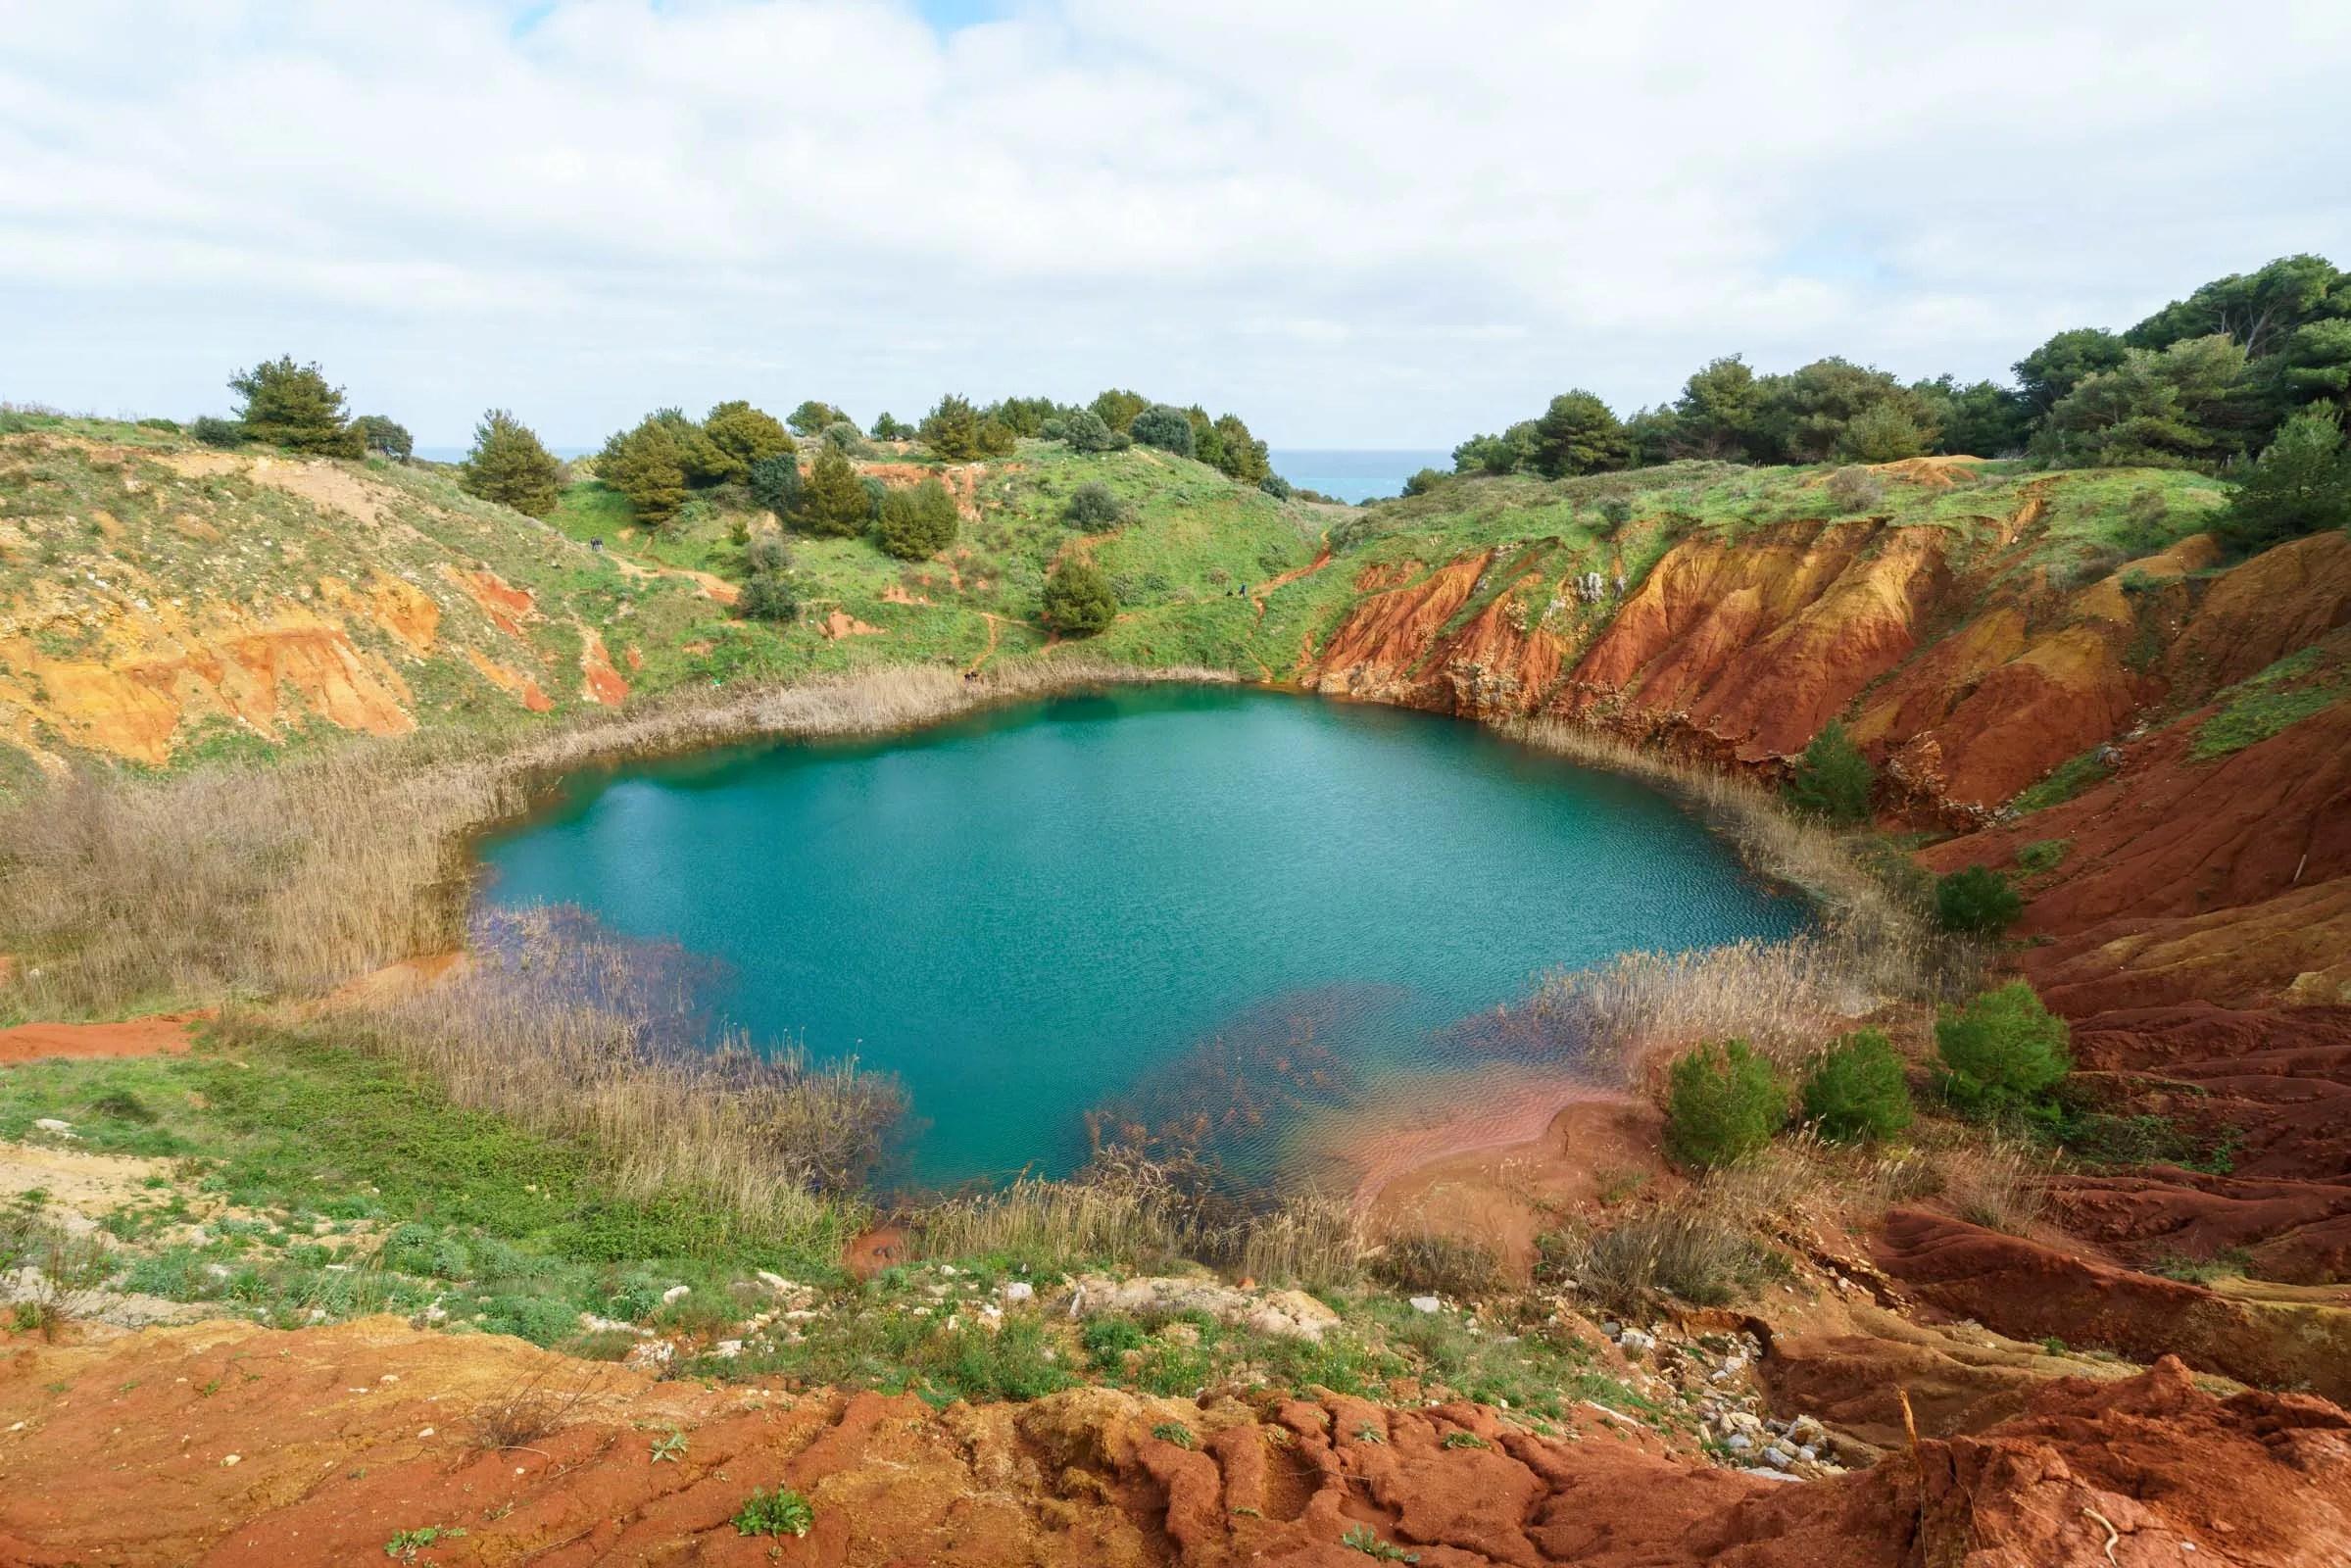 bauxite quarry Otranto Puglia by BeeYond Travel